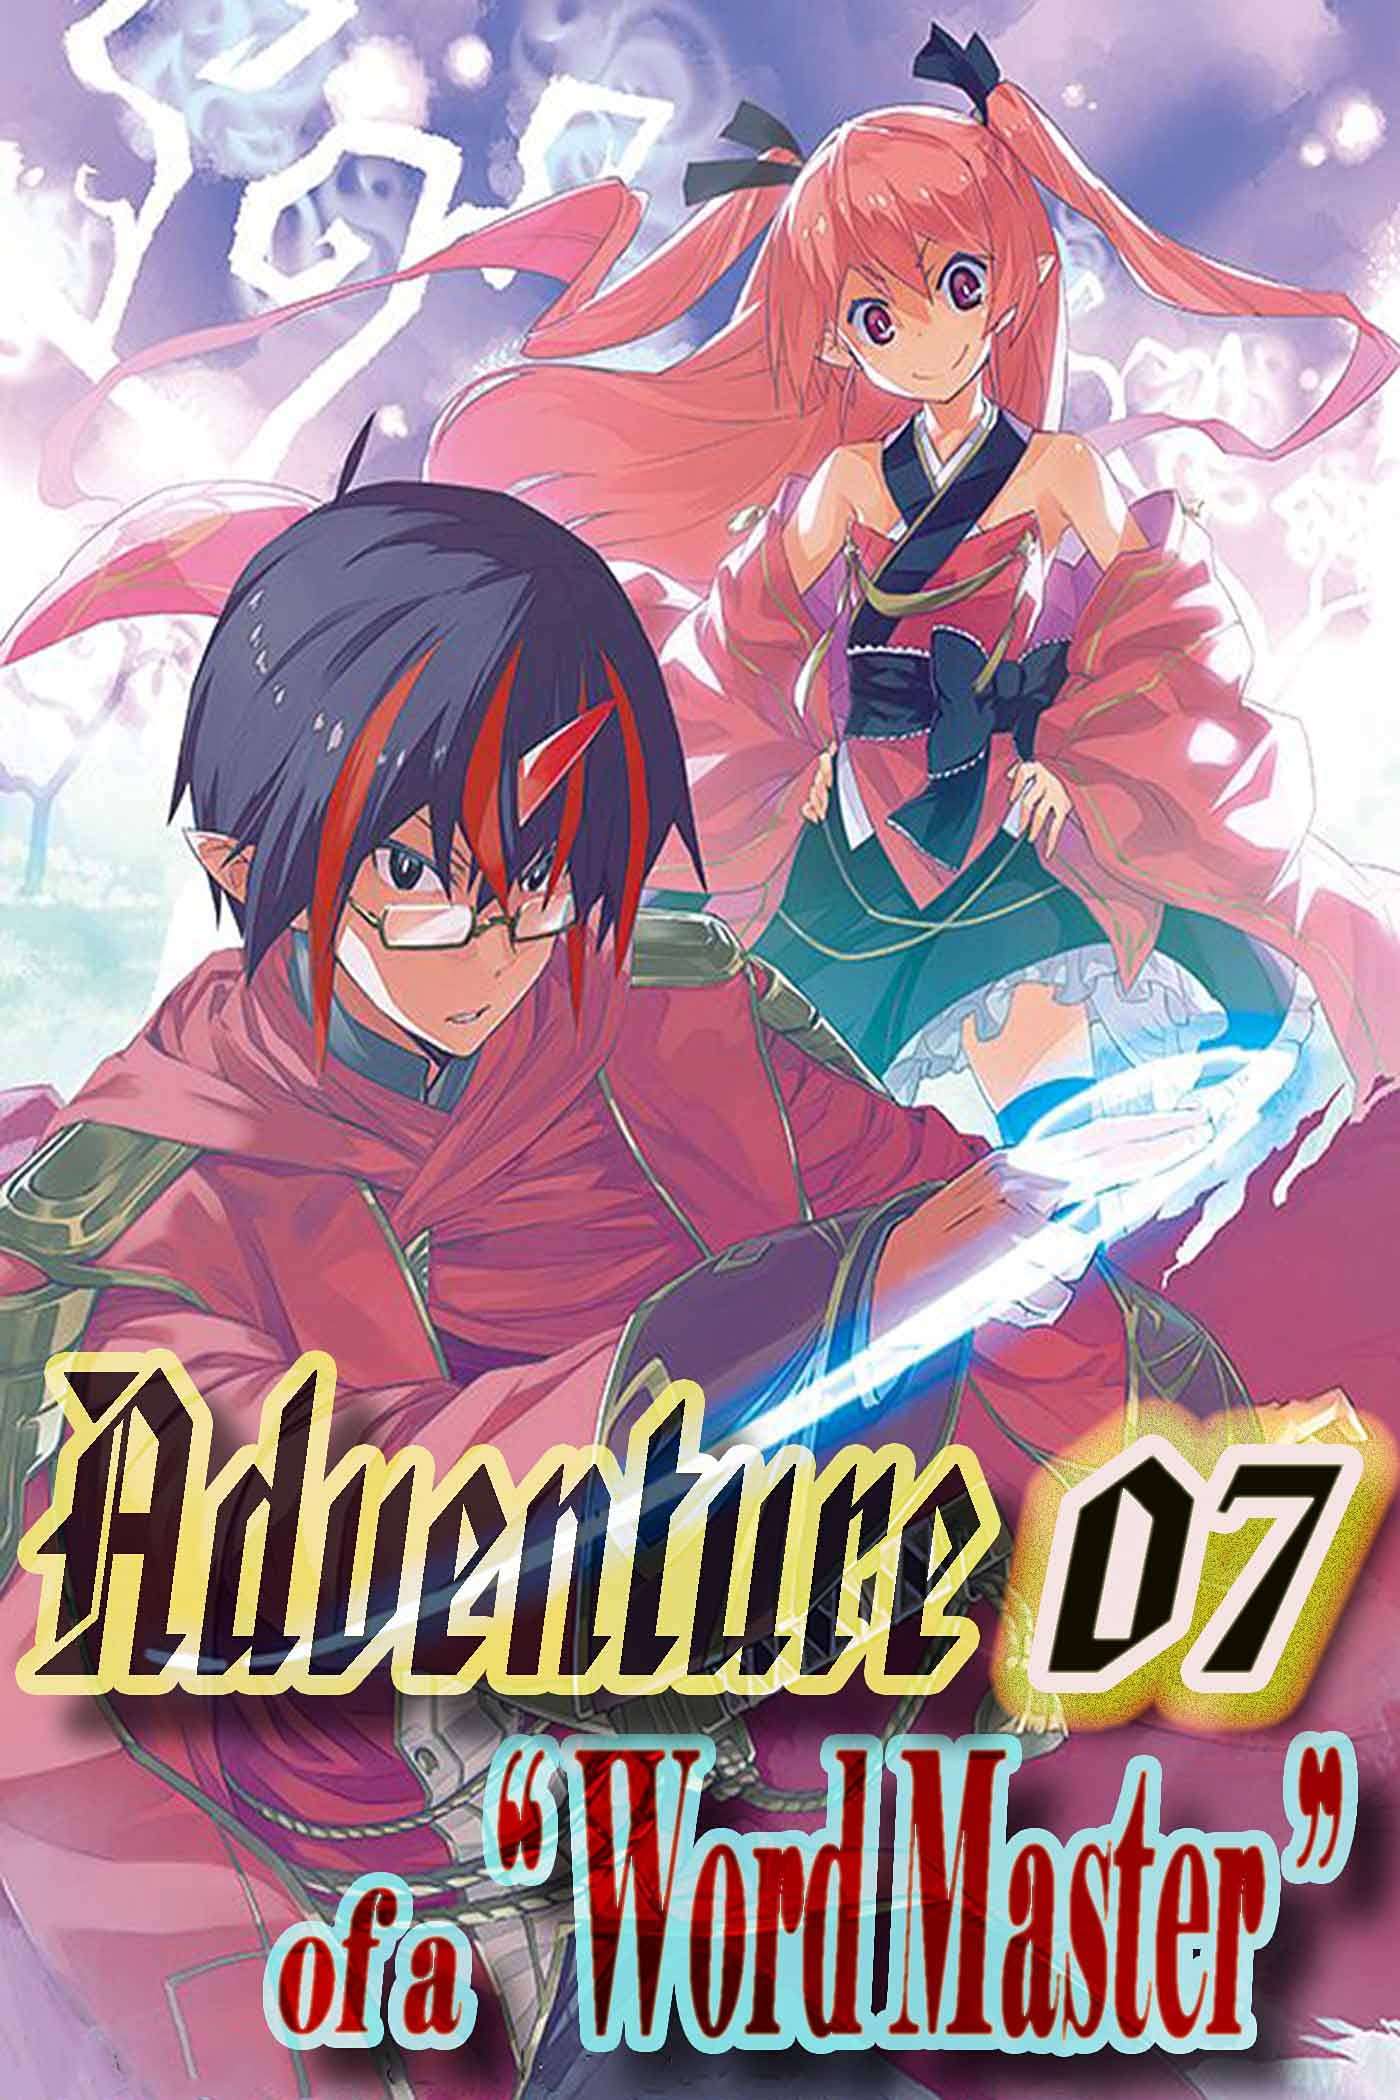 Loner adventure in fantasy World: Unique Class: Word Master Manga Vol 7